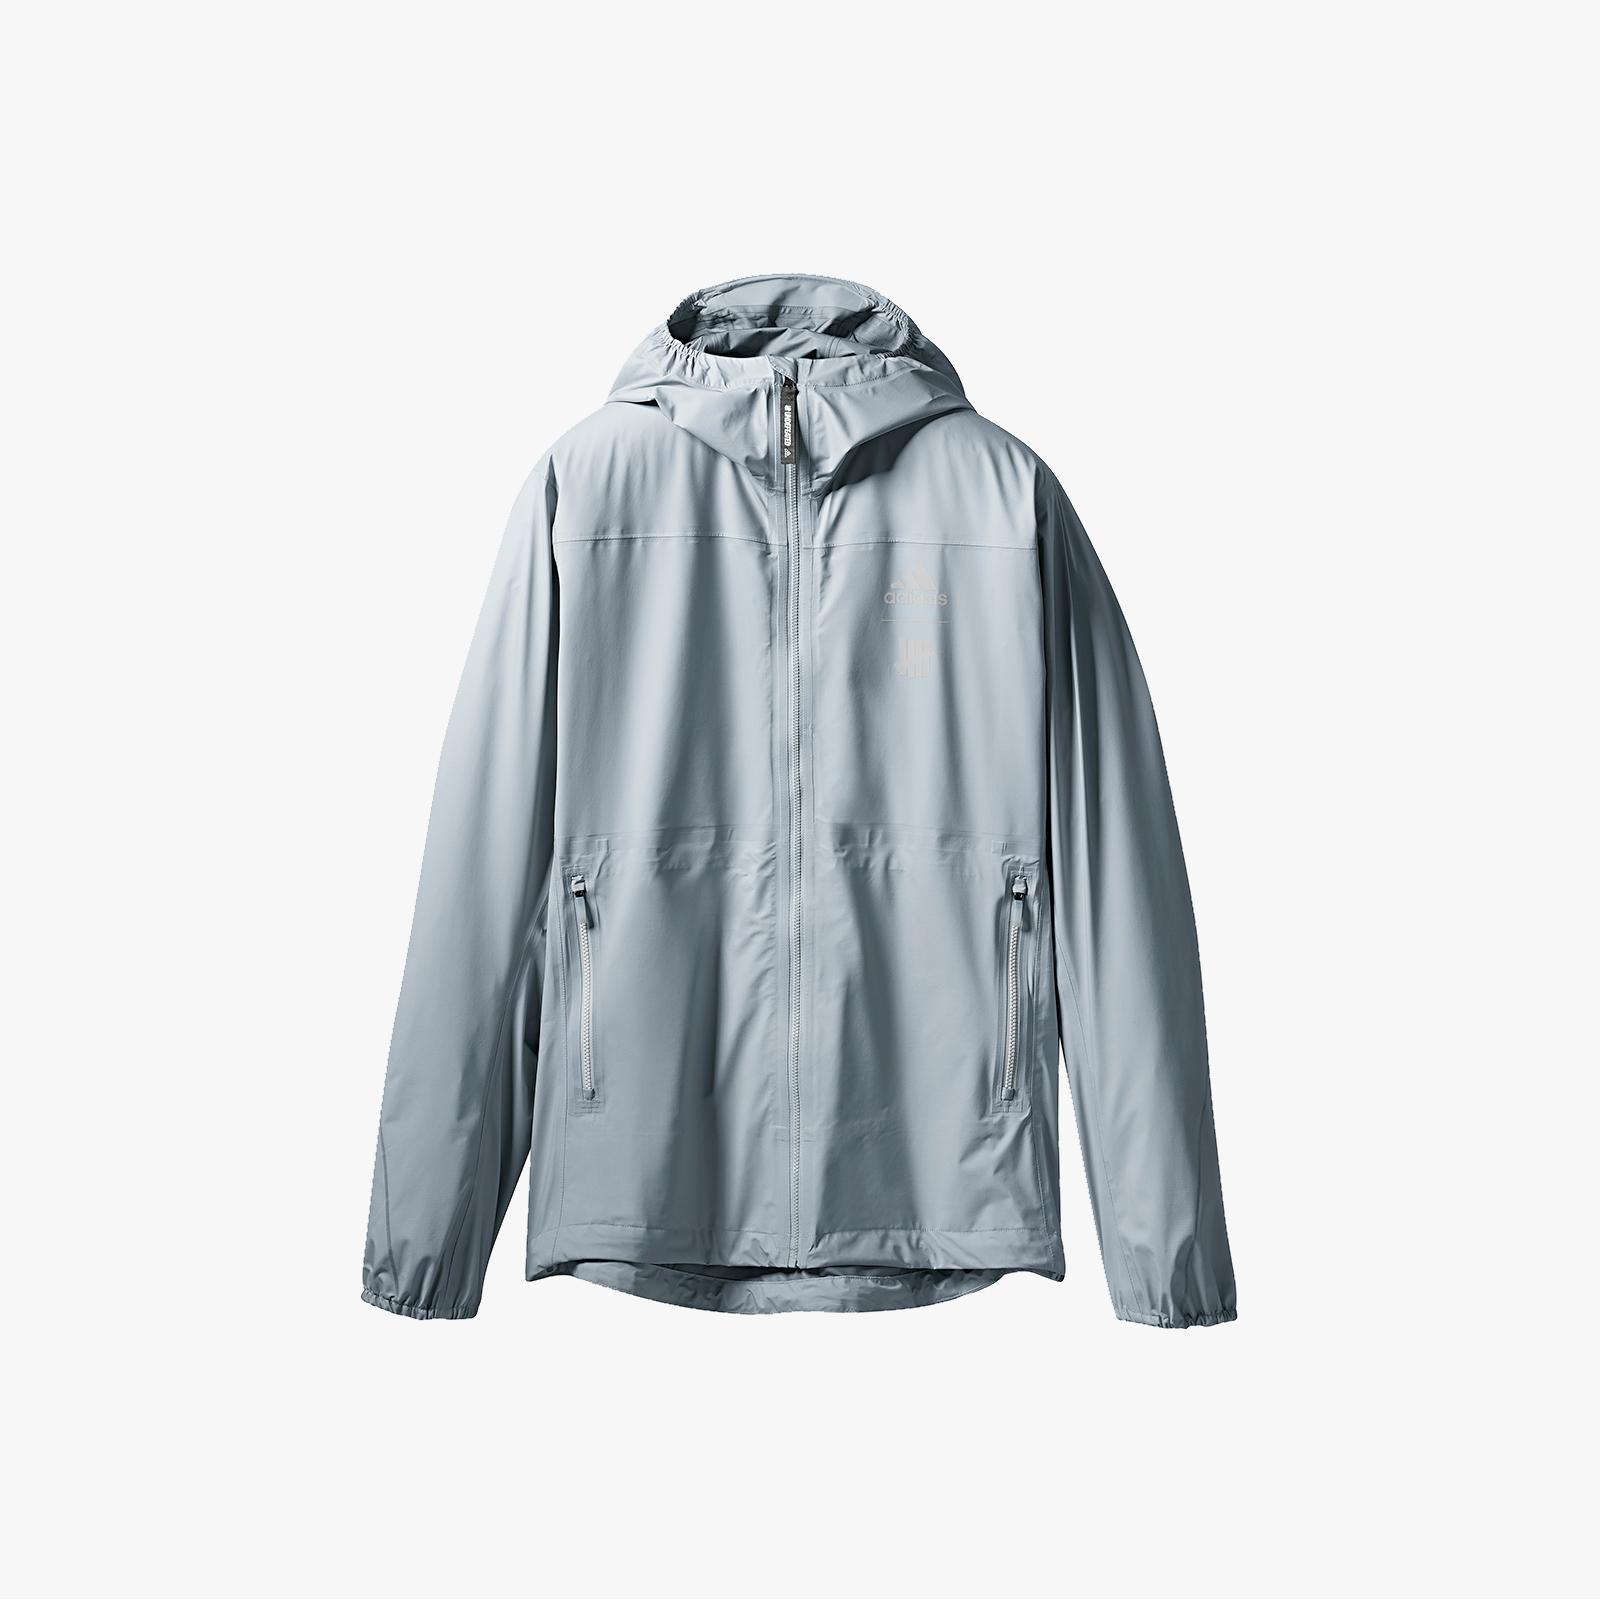 adidas gore tex jacket